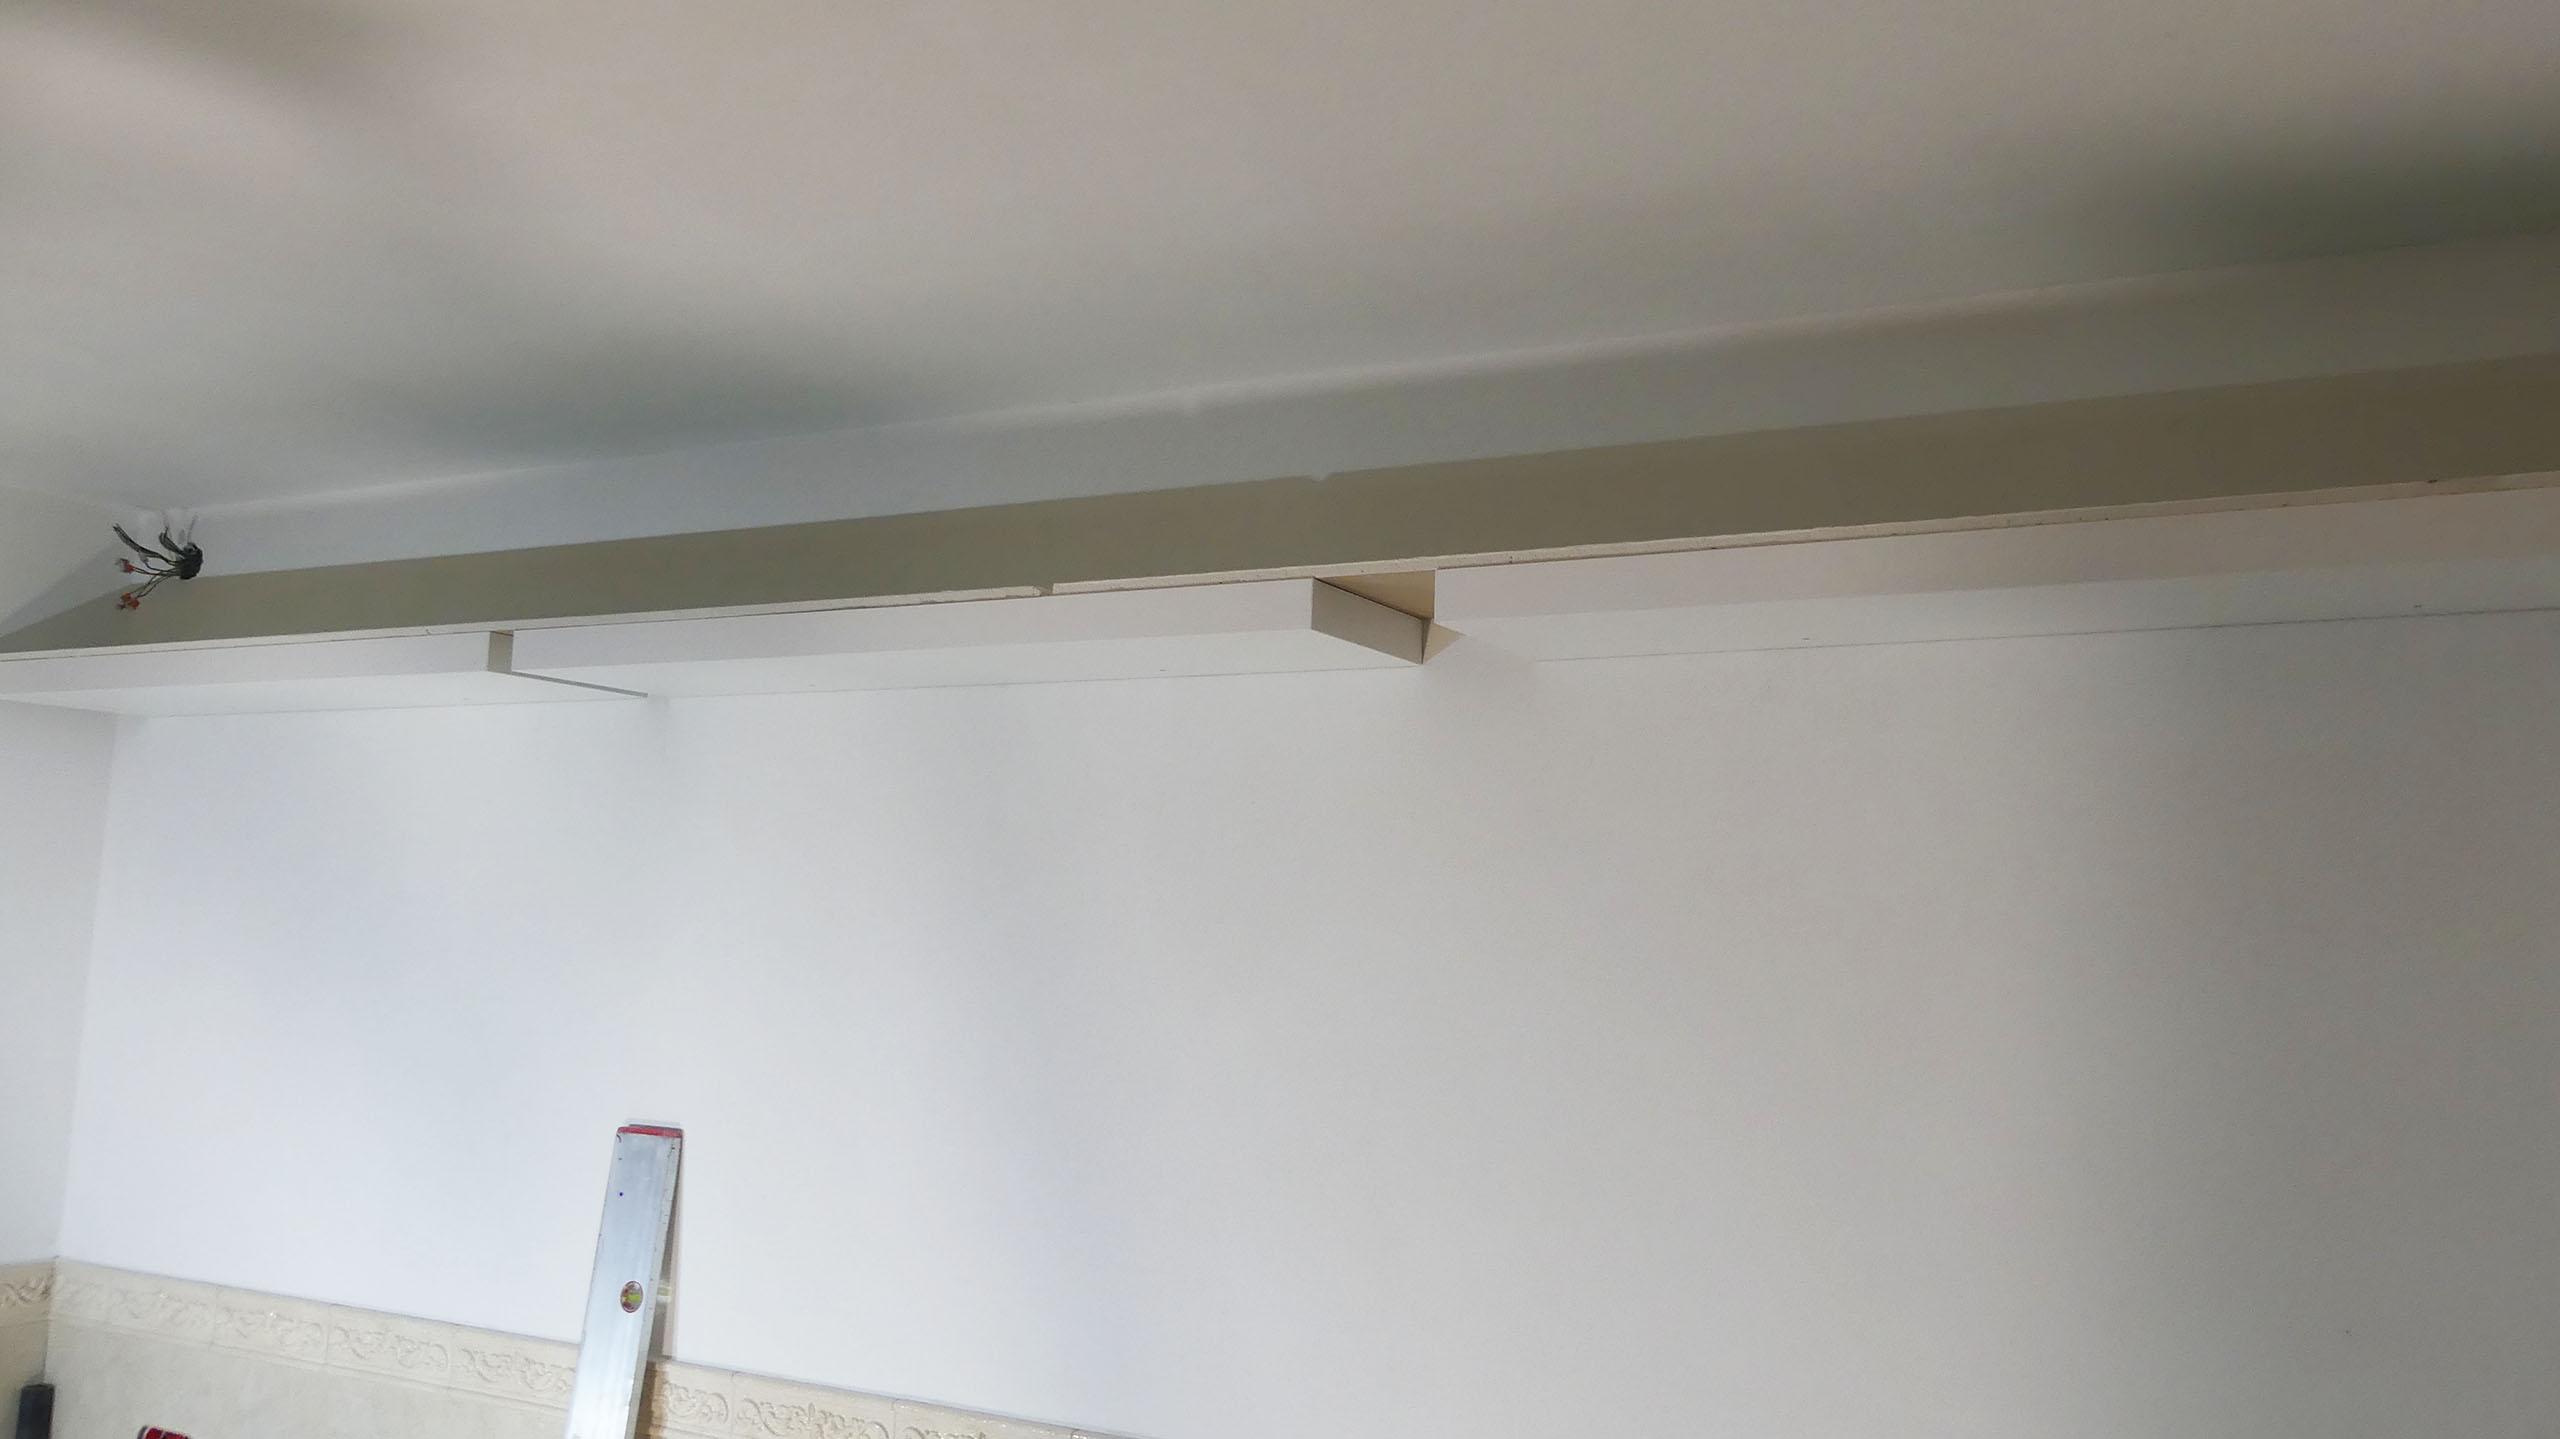 Build a new wall shelf or lightboard from IKEA Lack wall